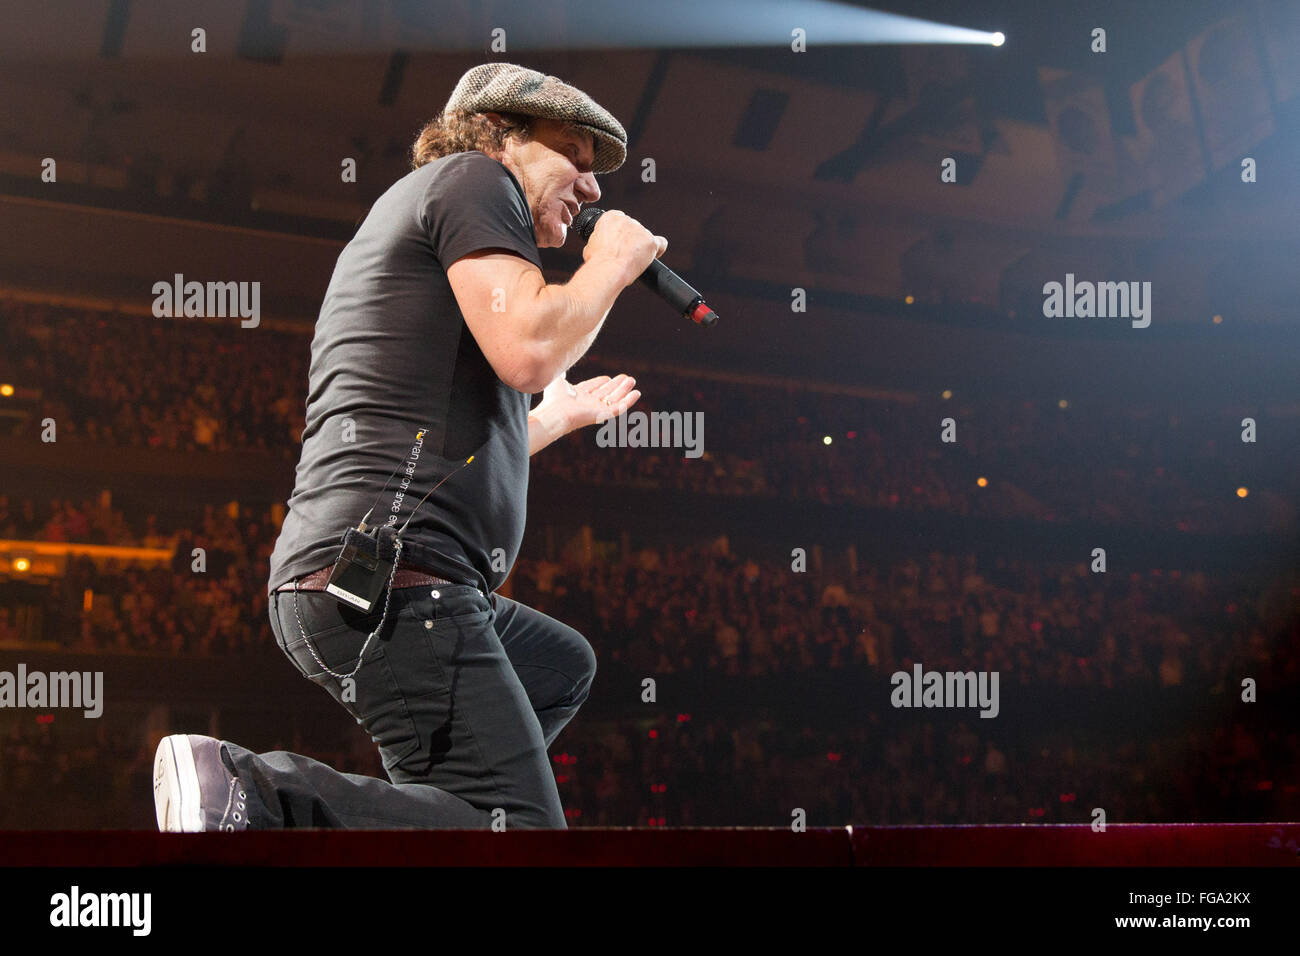 Chicago, Illinois, USA. 17th Feb, 2016. Singer BRIAN JOHNSON of AC ...